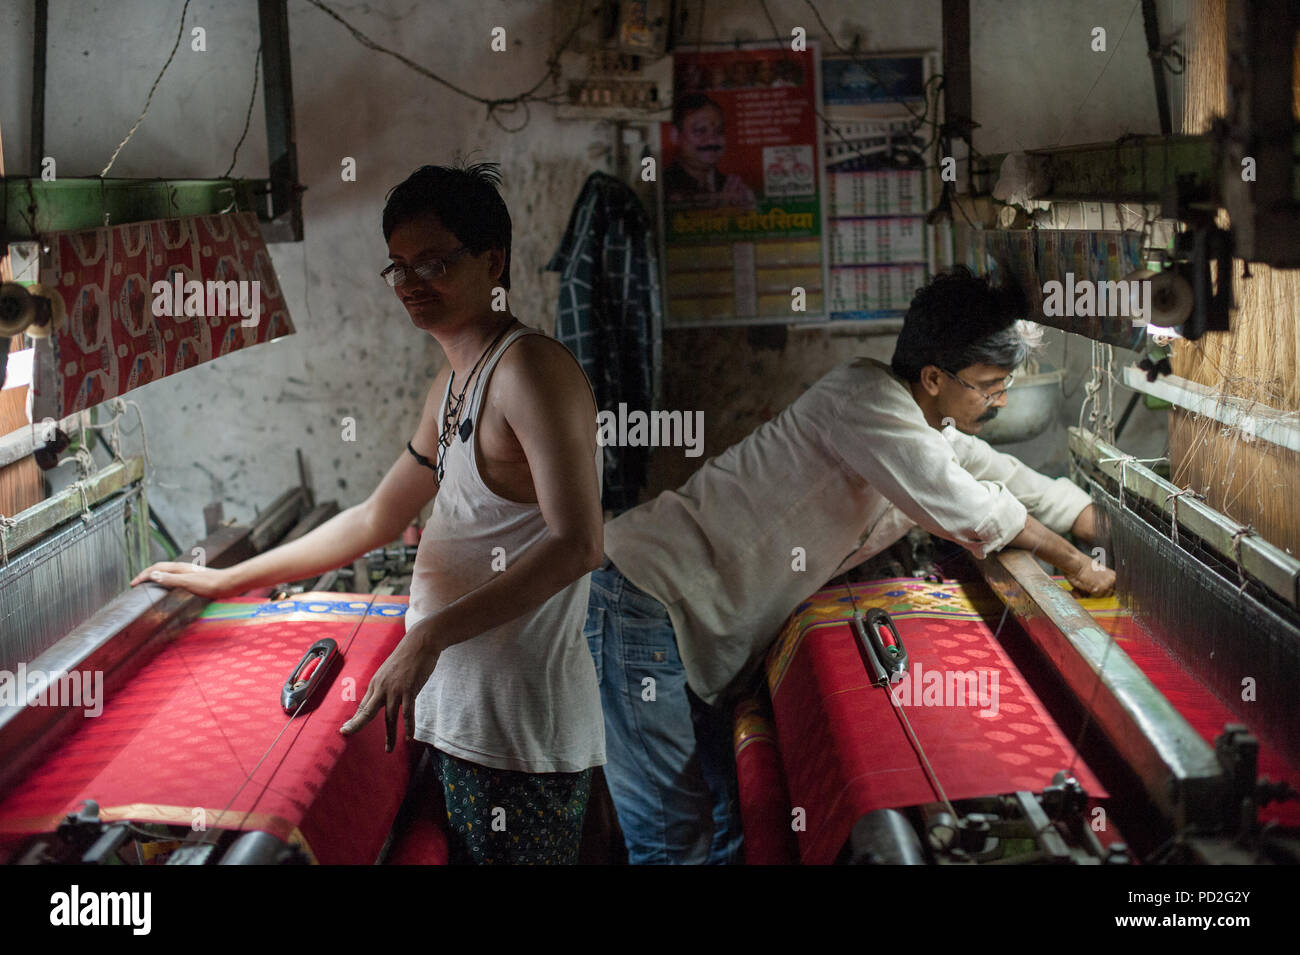 Silk spinning workshops in the weavers district of Varanasi, Uttar Pradesh, India - Stock Image